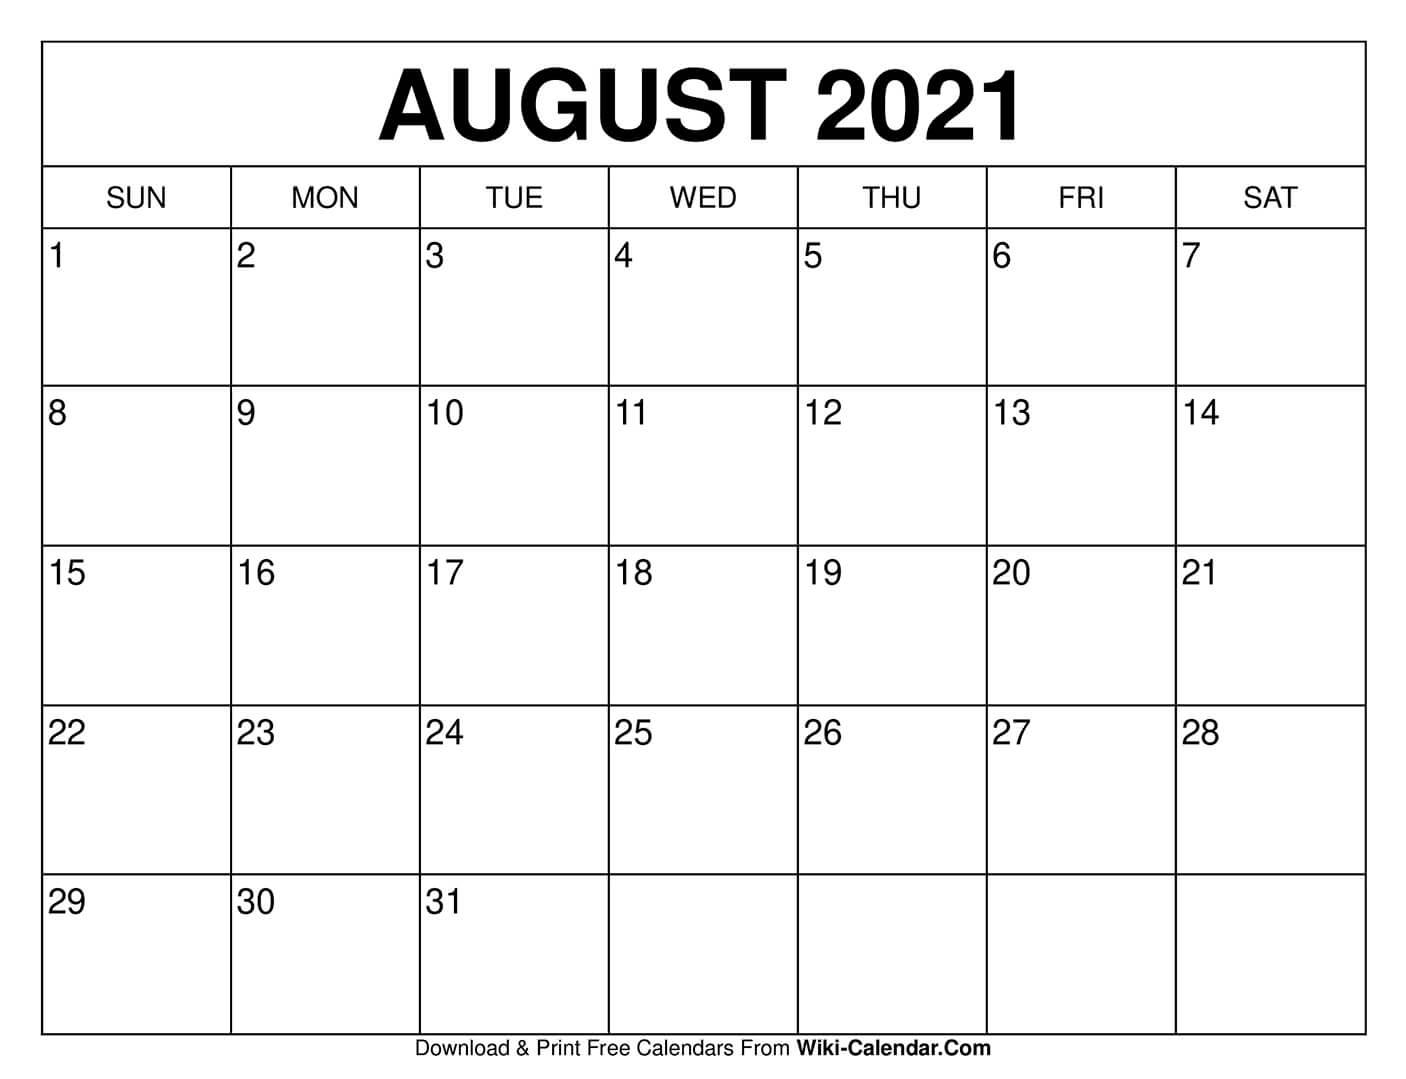 Get August 2021 Calendar Printable